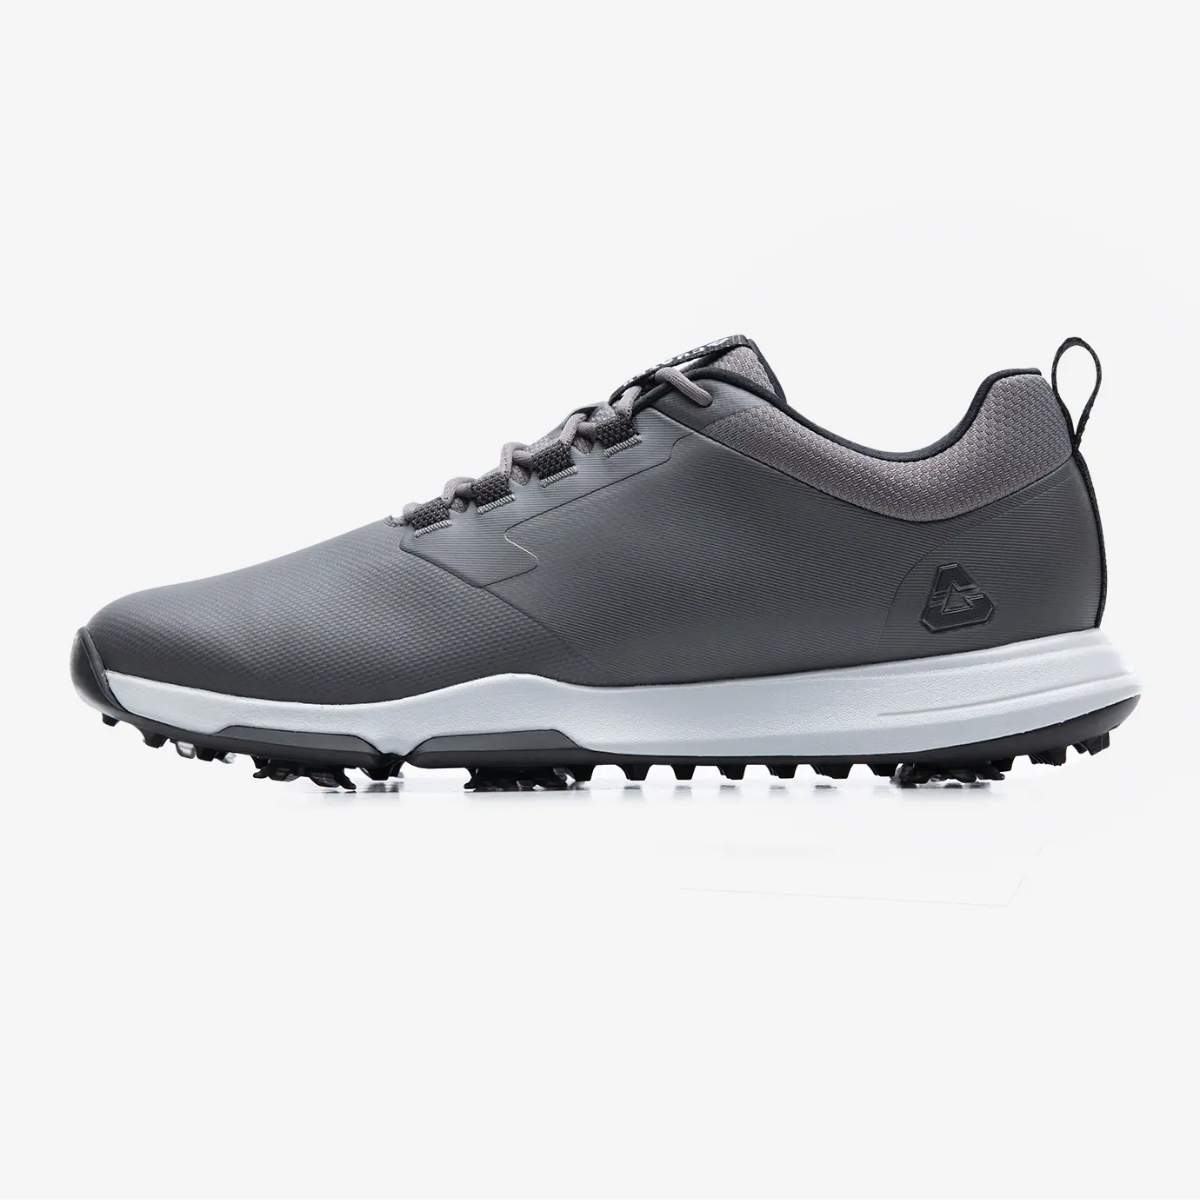 TravisMathew Cuater The Ringer Golf Shoe